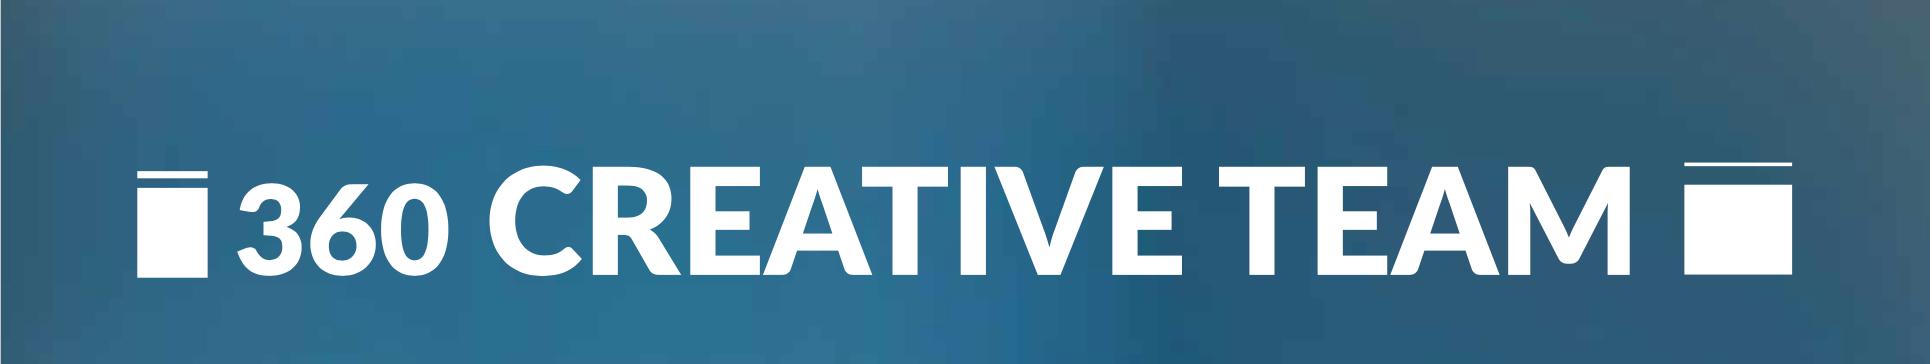 360 CREATIVE TEAM